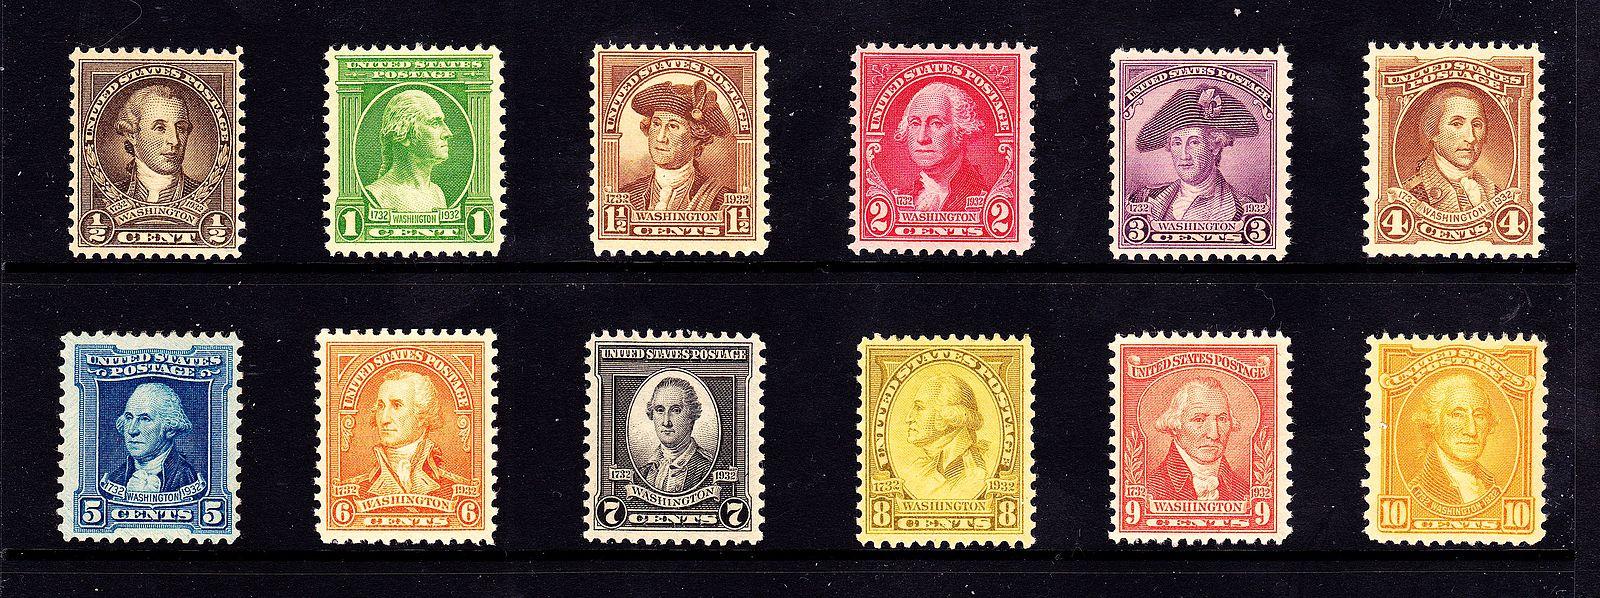 Washington Bicentennial Issue Of 1932